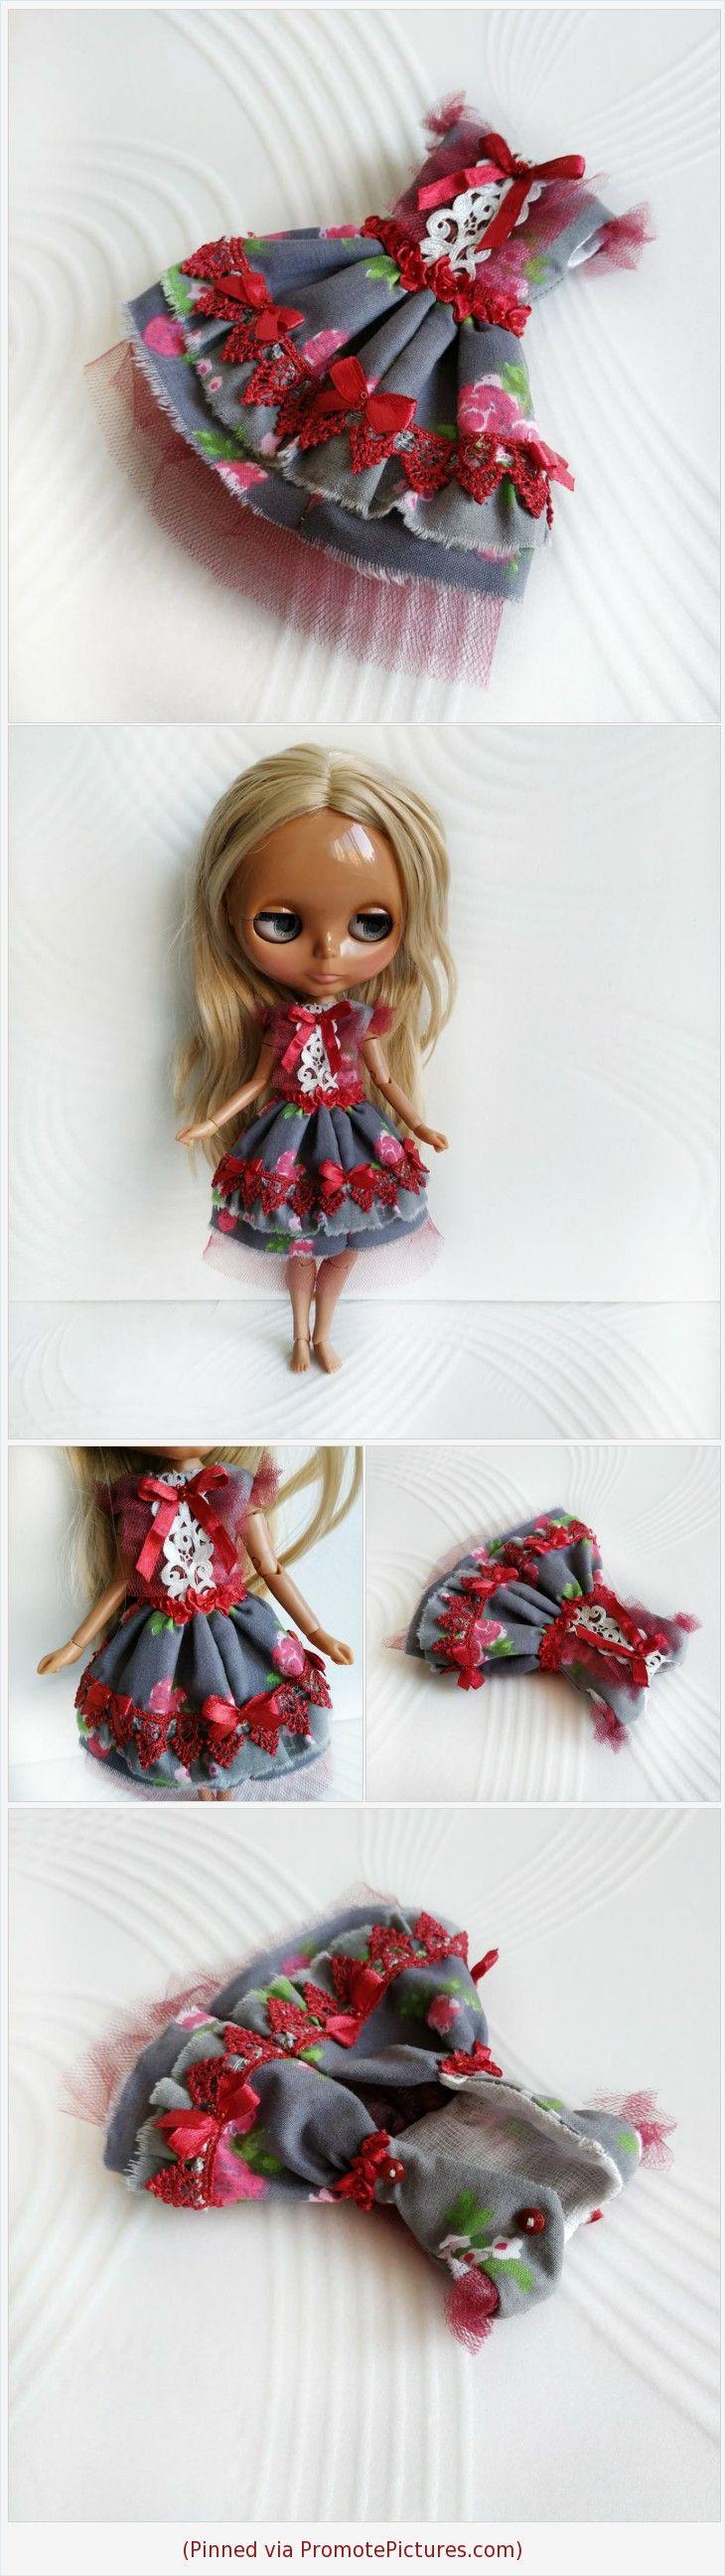 Items similar to Blythe doll Shabby chic lace dress on Etsy